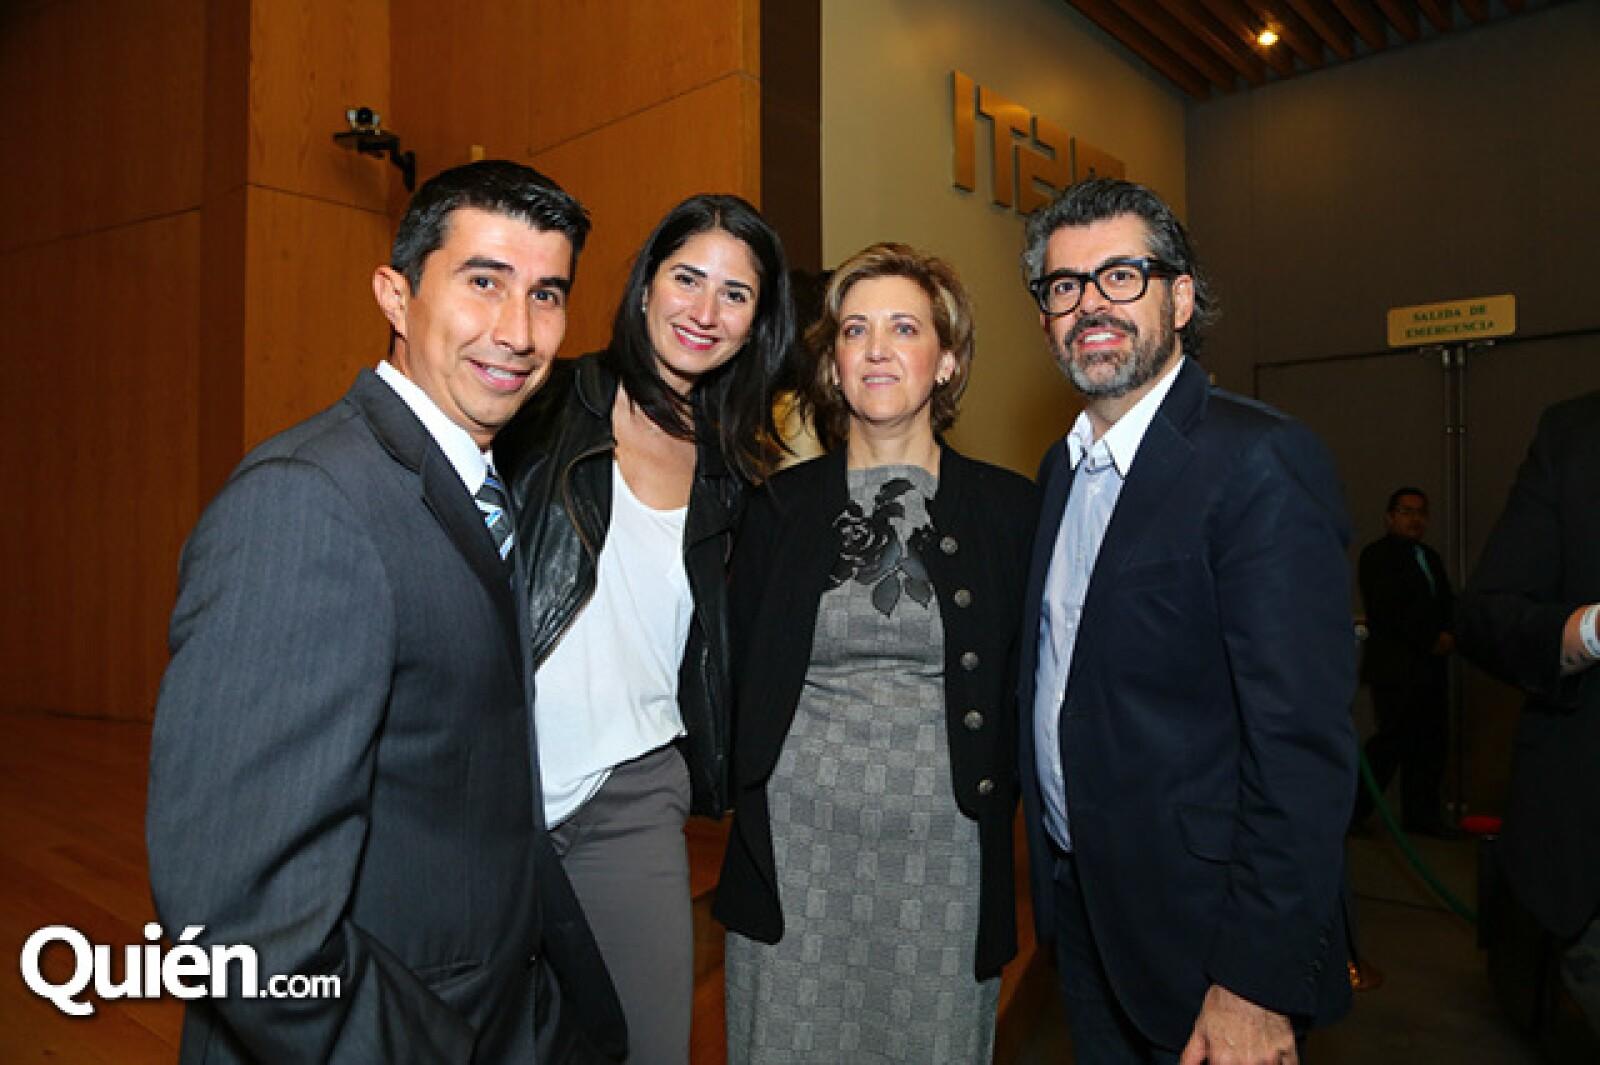 Jorge Romero, Nathalie Baaklini, Mónica Sacristán y Carlos Salcido